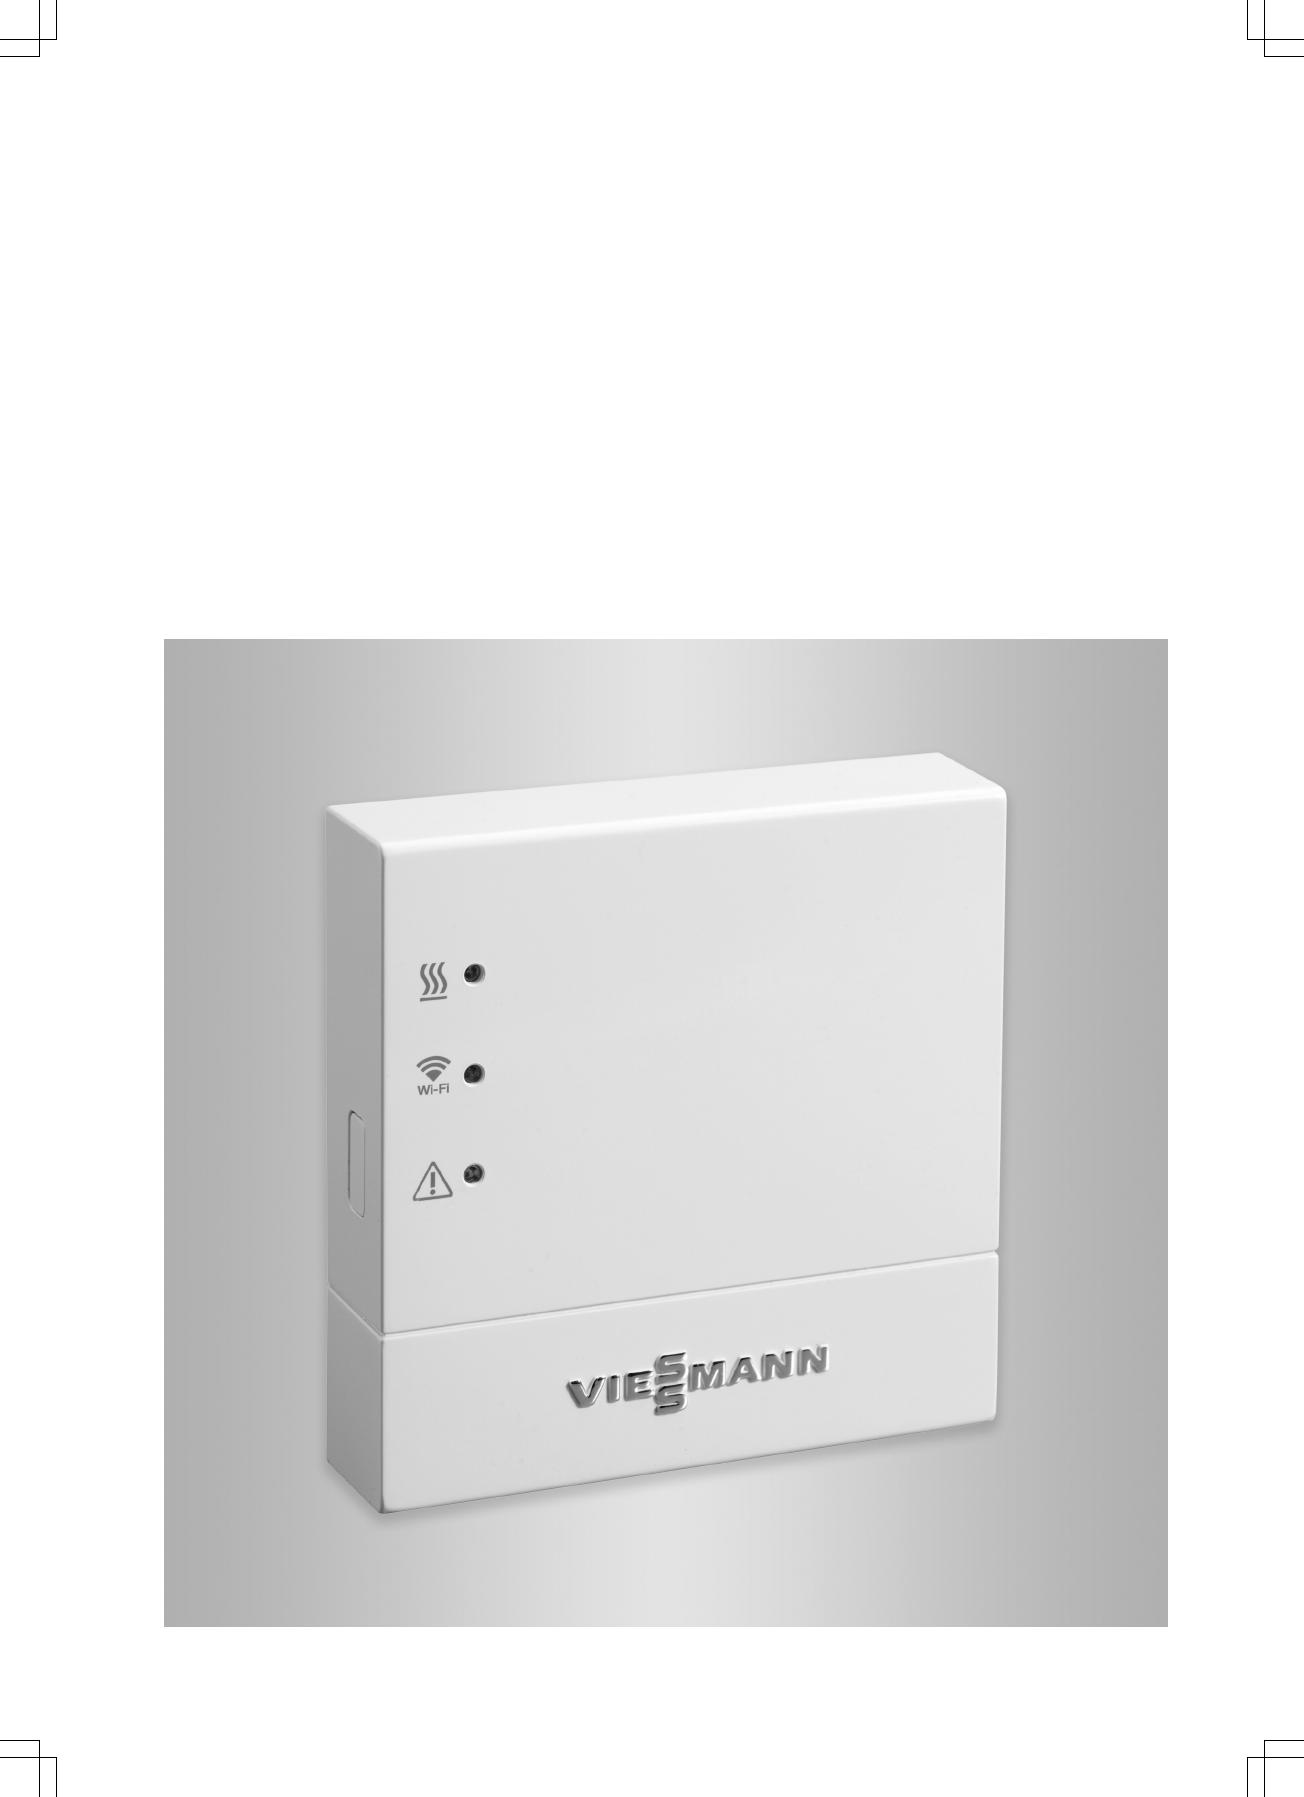 Handleiding viessmann vitoconnect 100 opto1 pagina 1 van for Viessmann vitoconnect